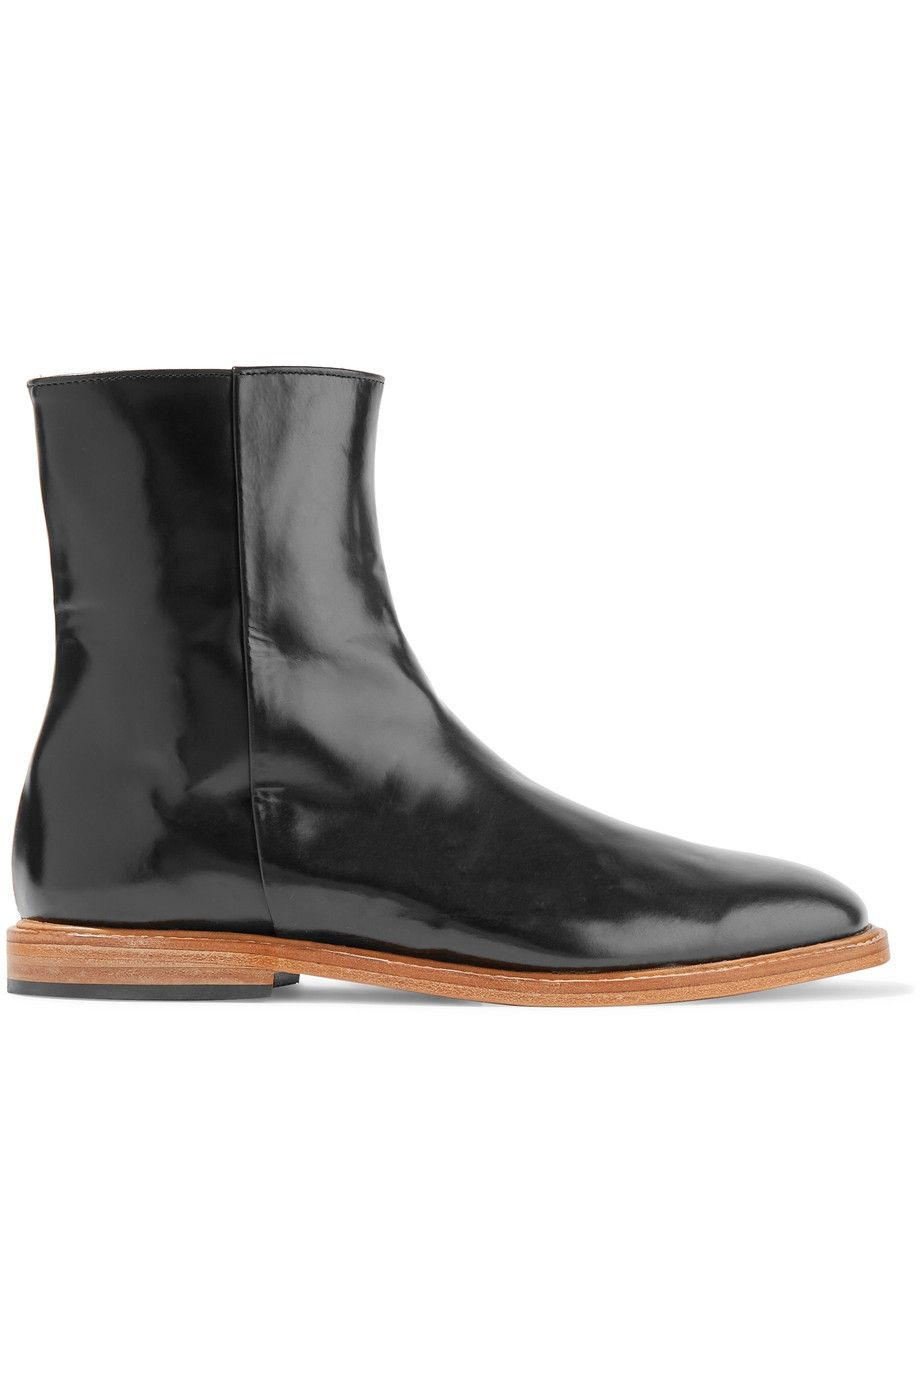 9dd4edad894 DIEPPA RESTREPO .  diepparestrepo  shoes